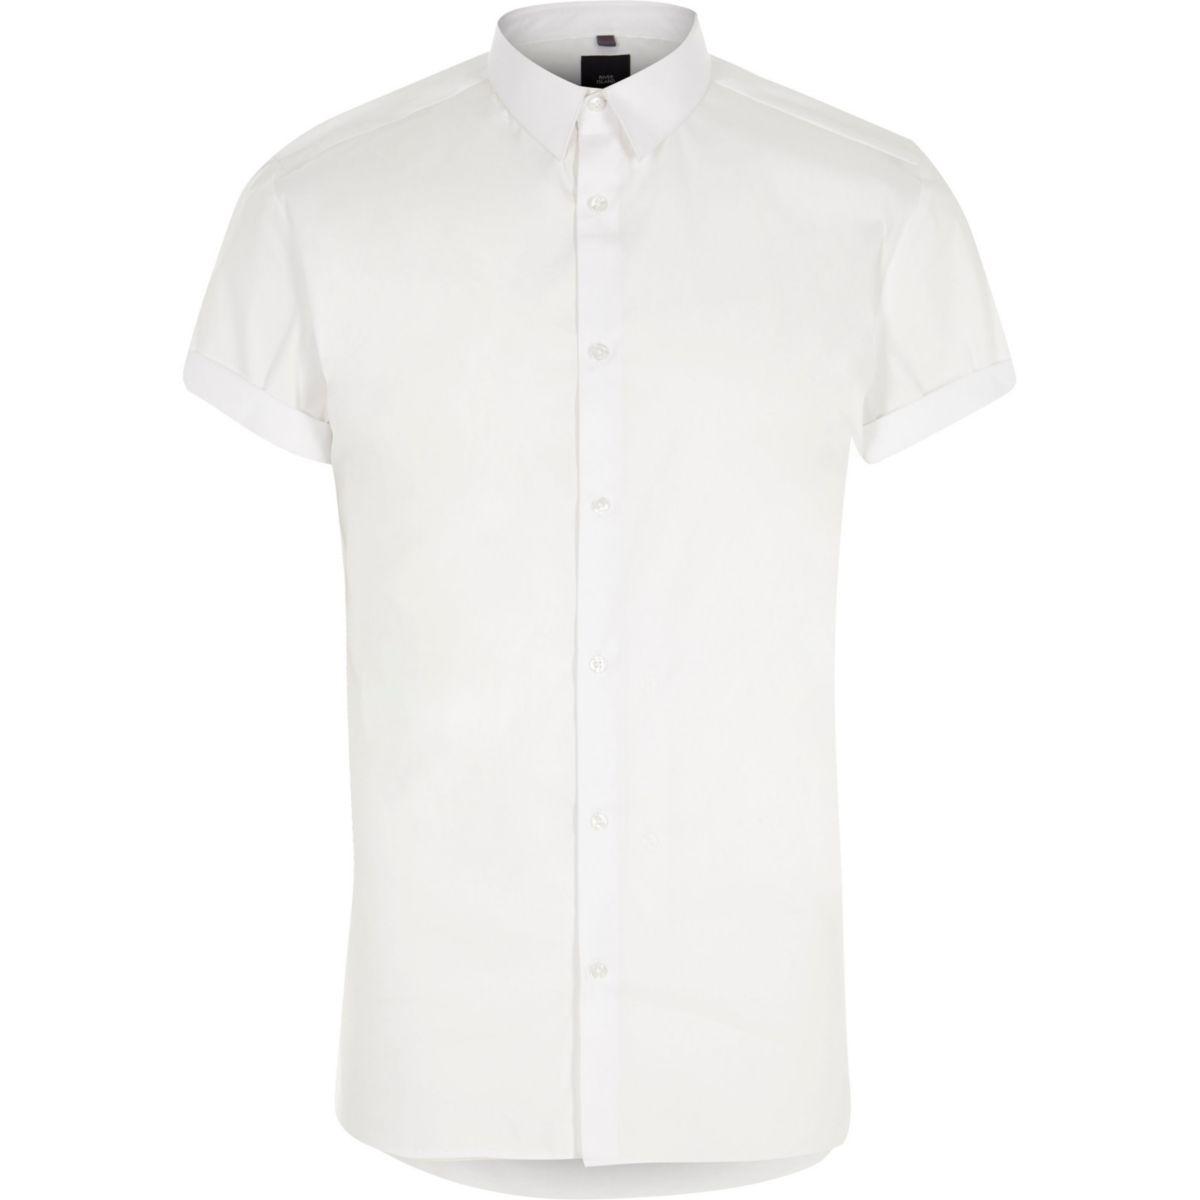 shirt and Big sleeve short white Tall XAw4wqHU